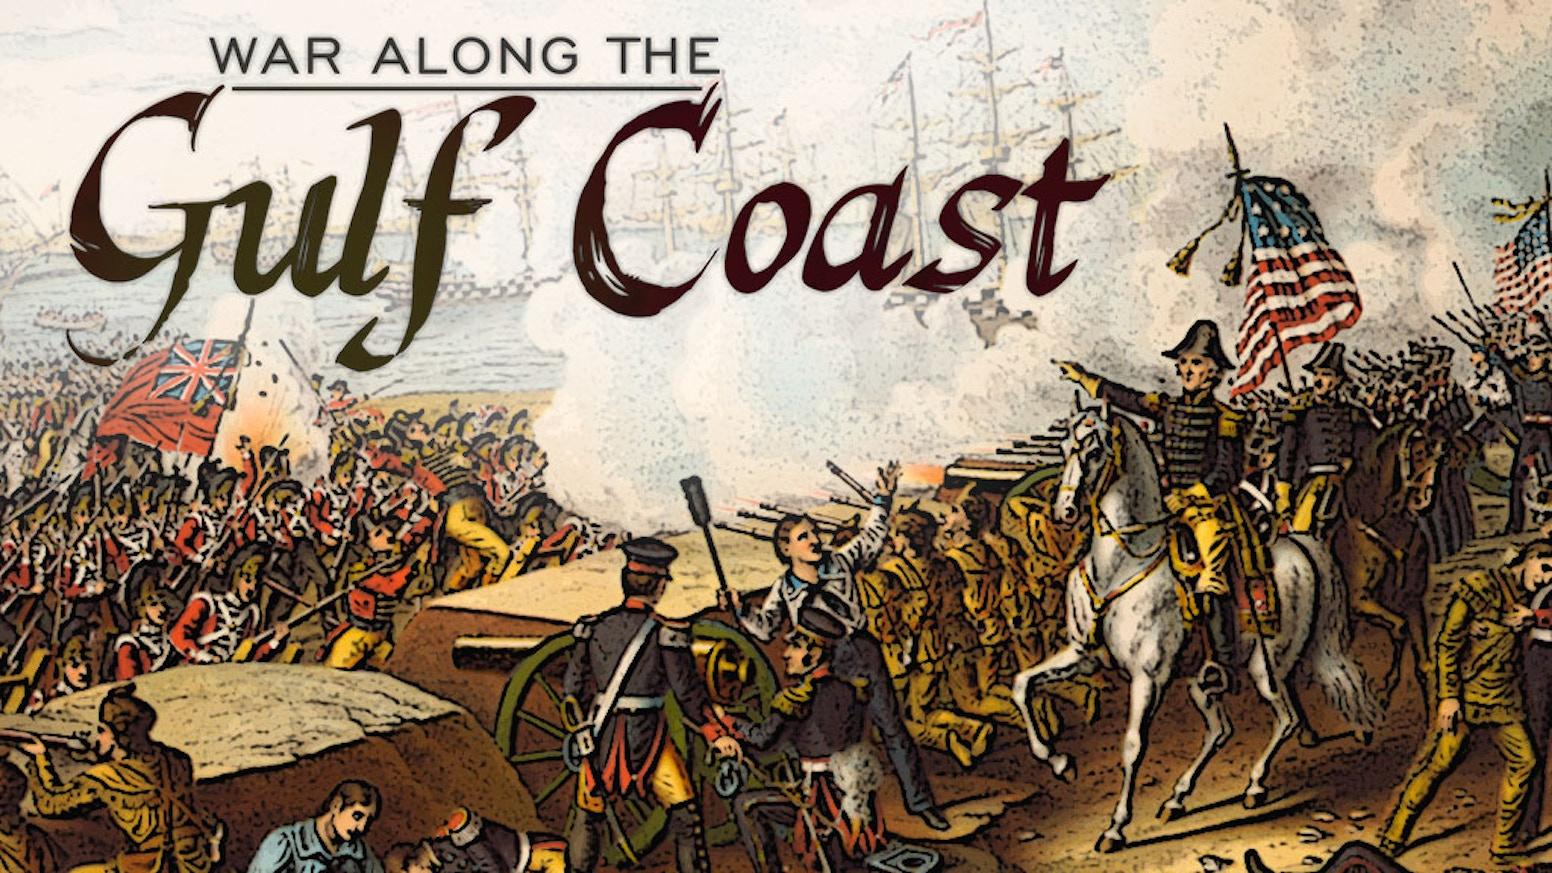 War Along the Gulf Coast- Limited 250 Kickstarter Copies by